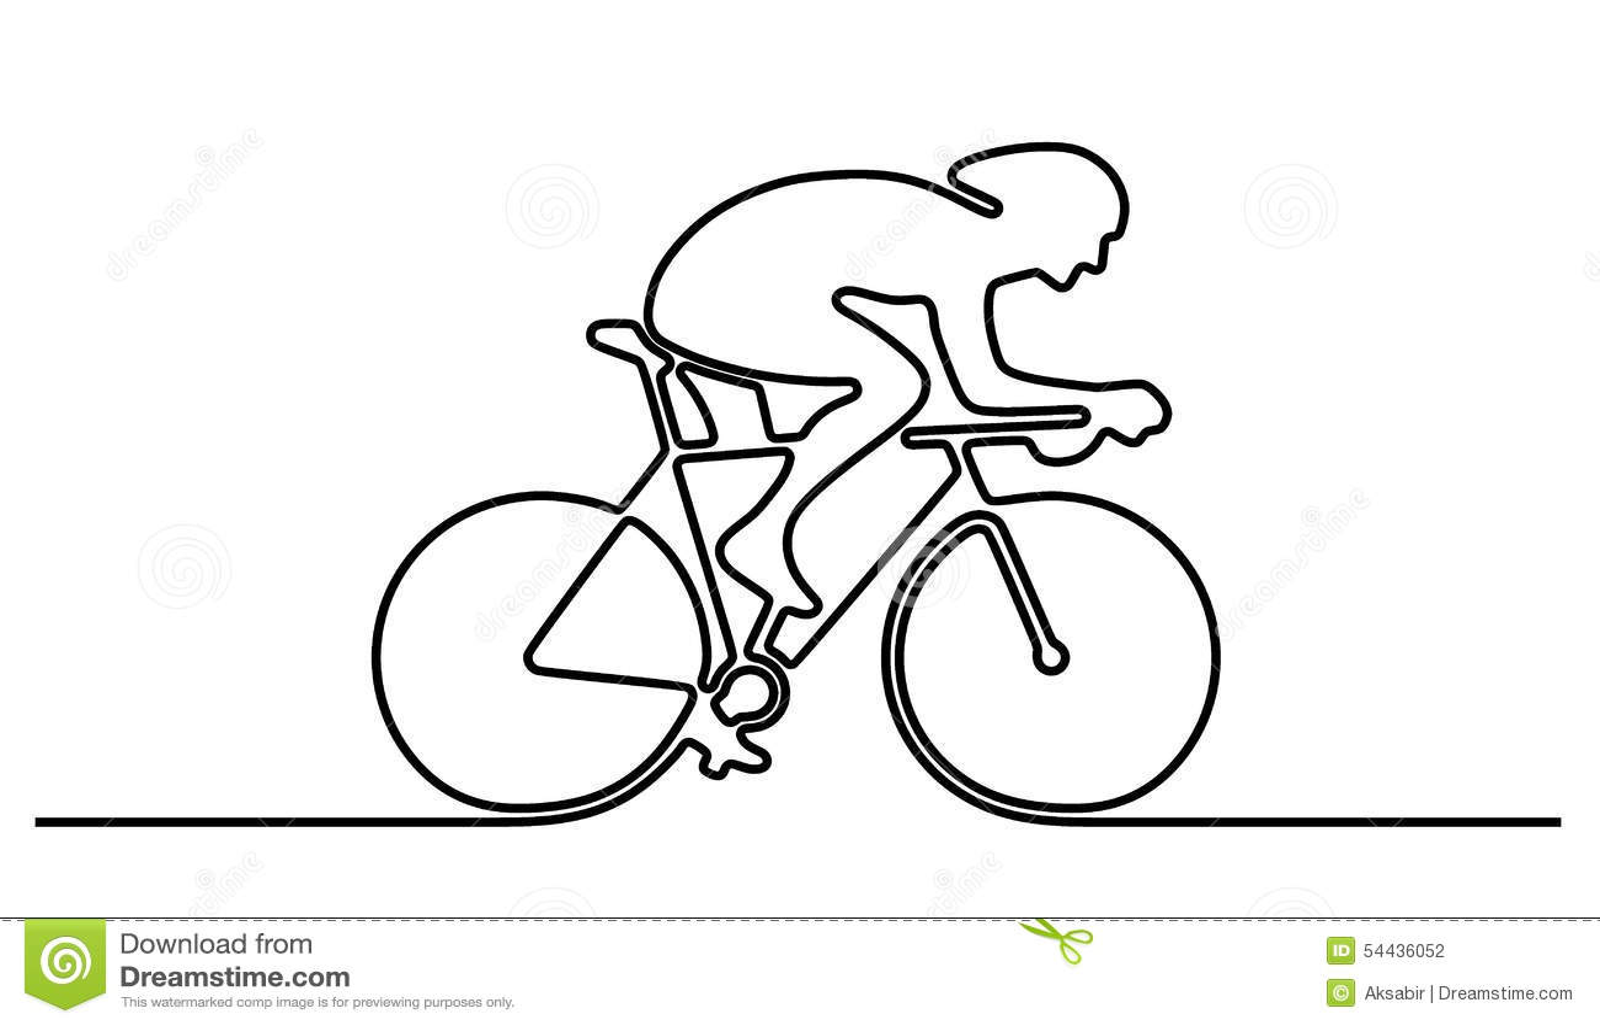 Line Drawing Bike : Bicycle logo stock illustration of champion